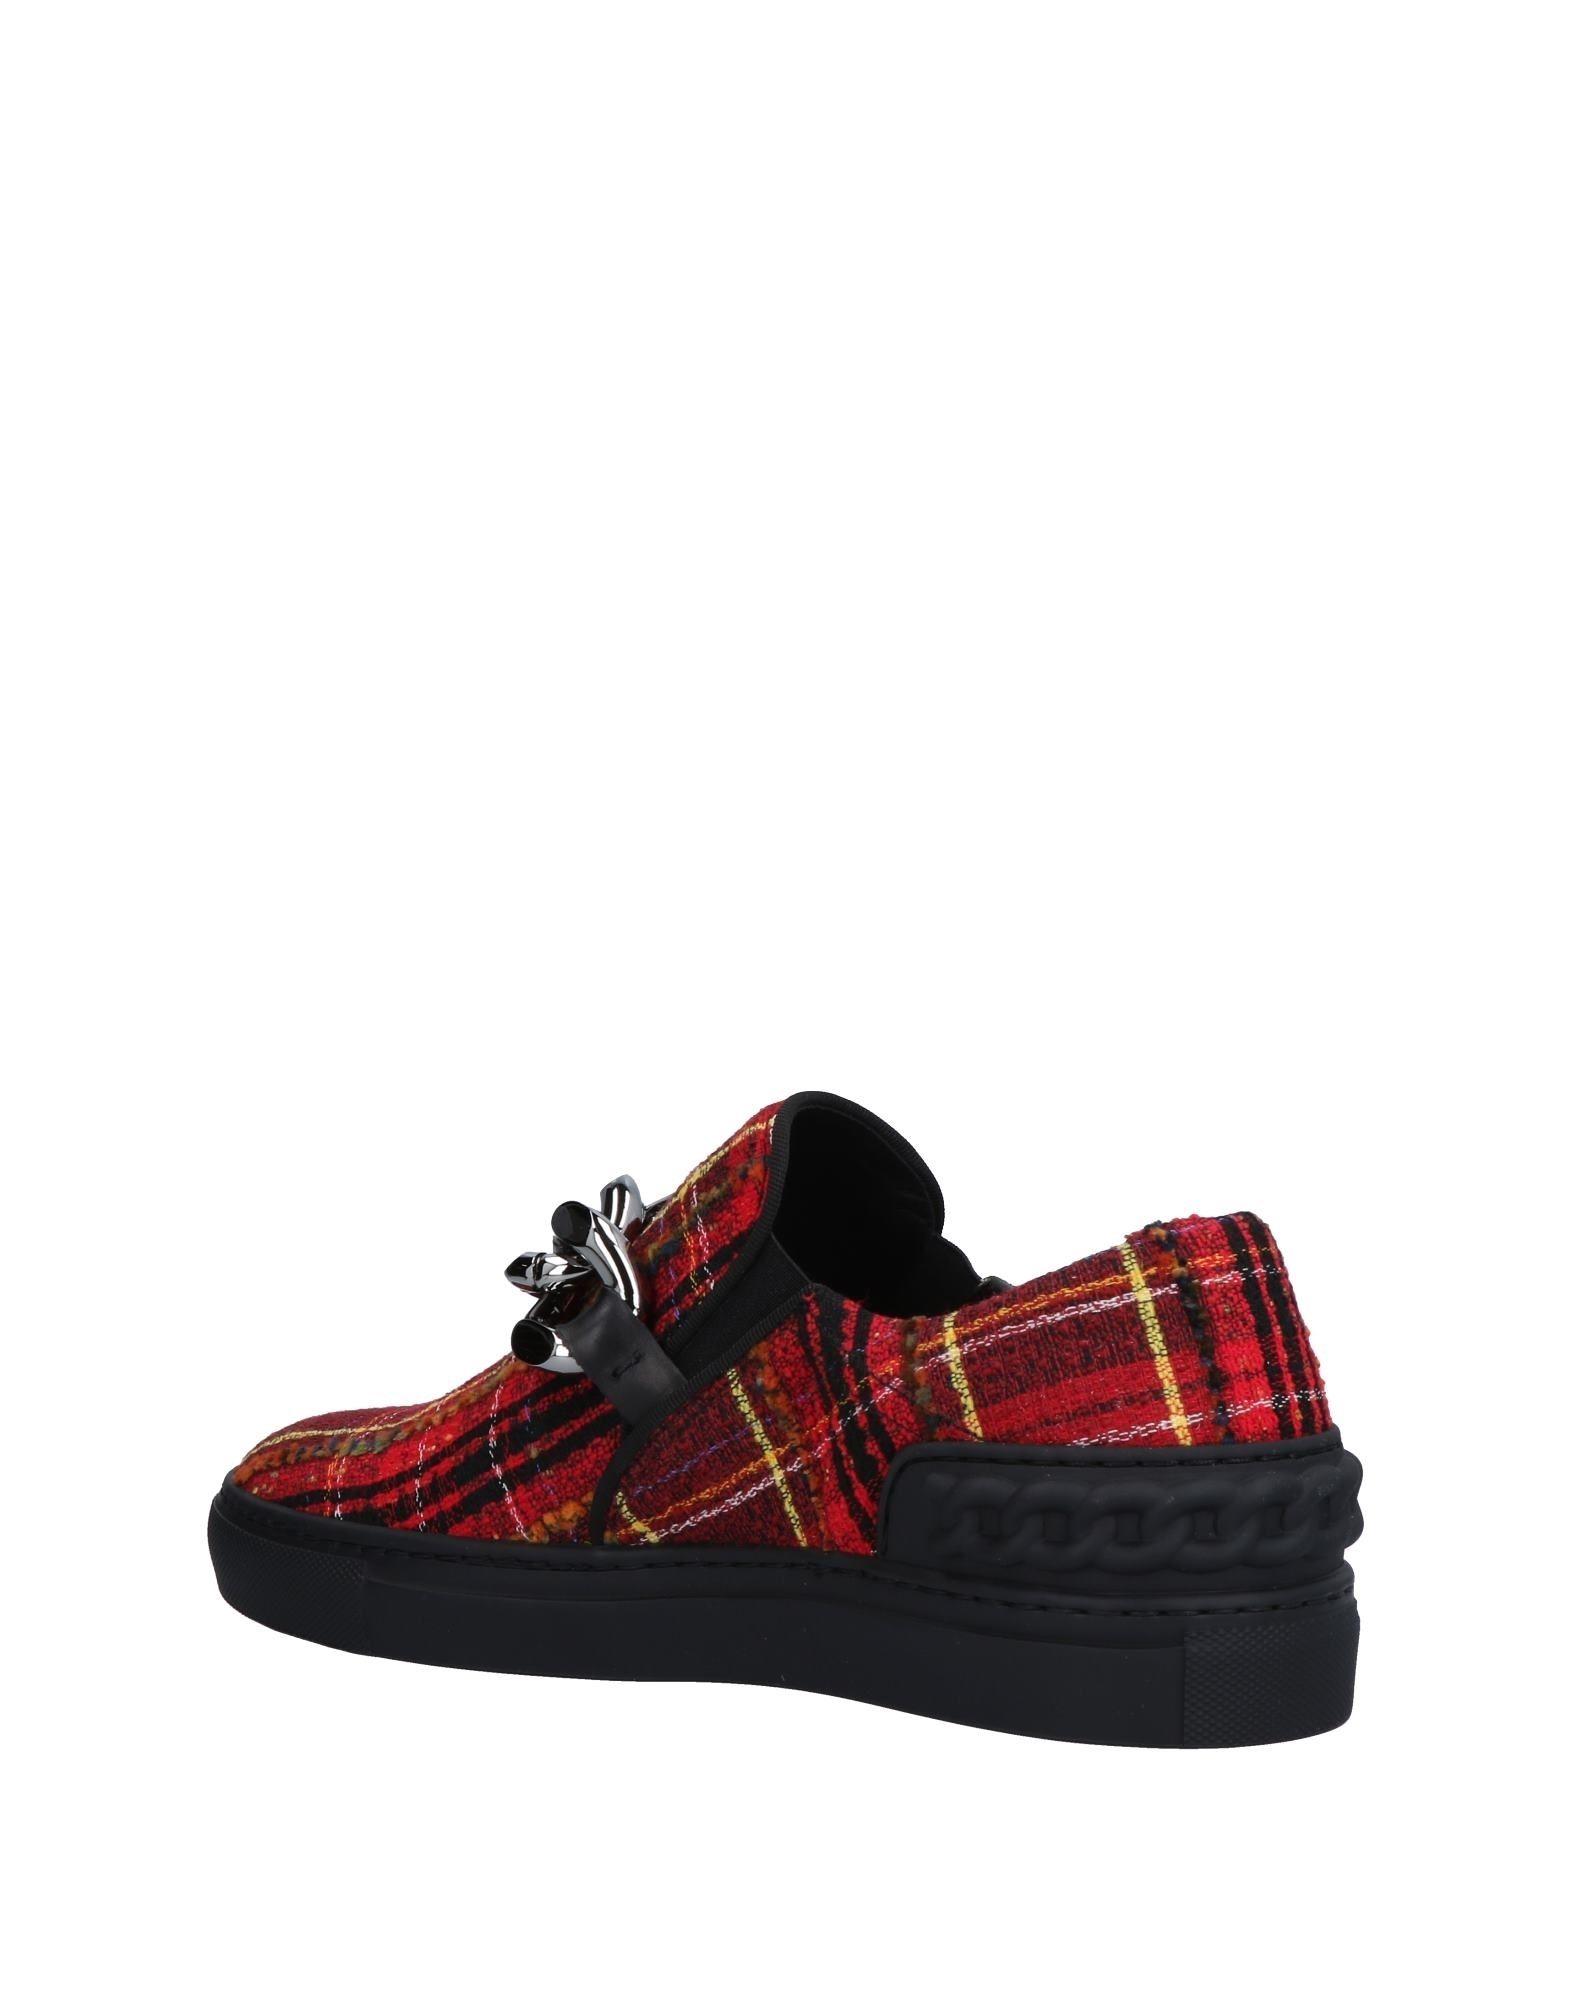 Cesare Casadei Sneakers Herren  11500426OM Gute Qualität beliebte Schuhe